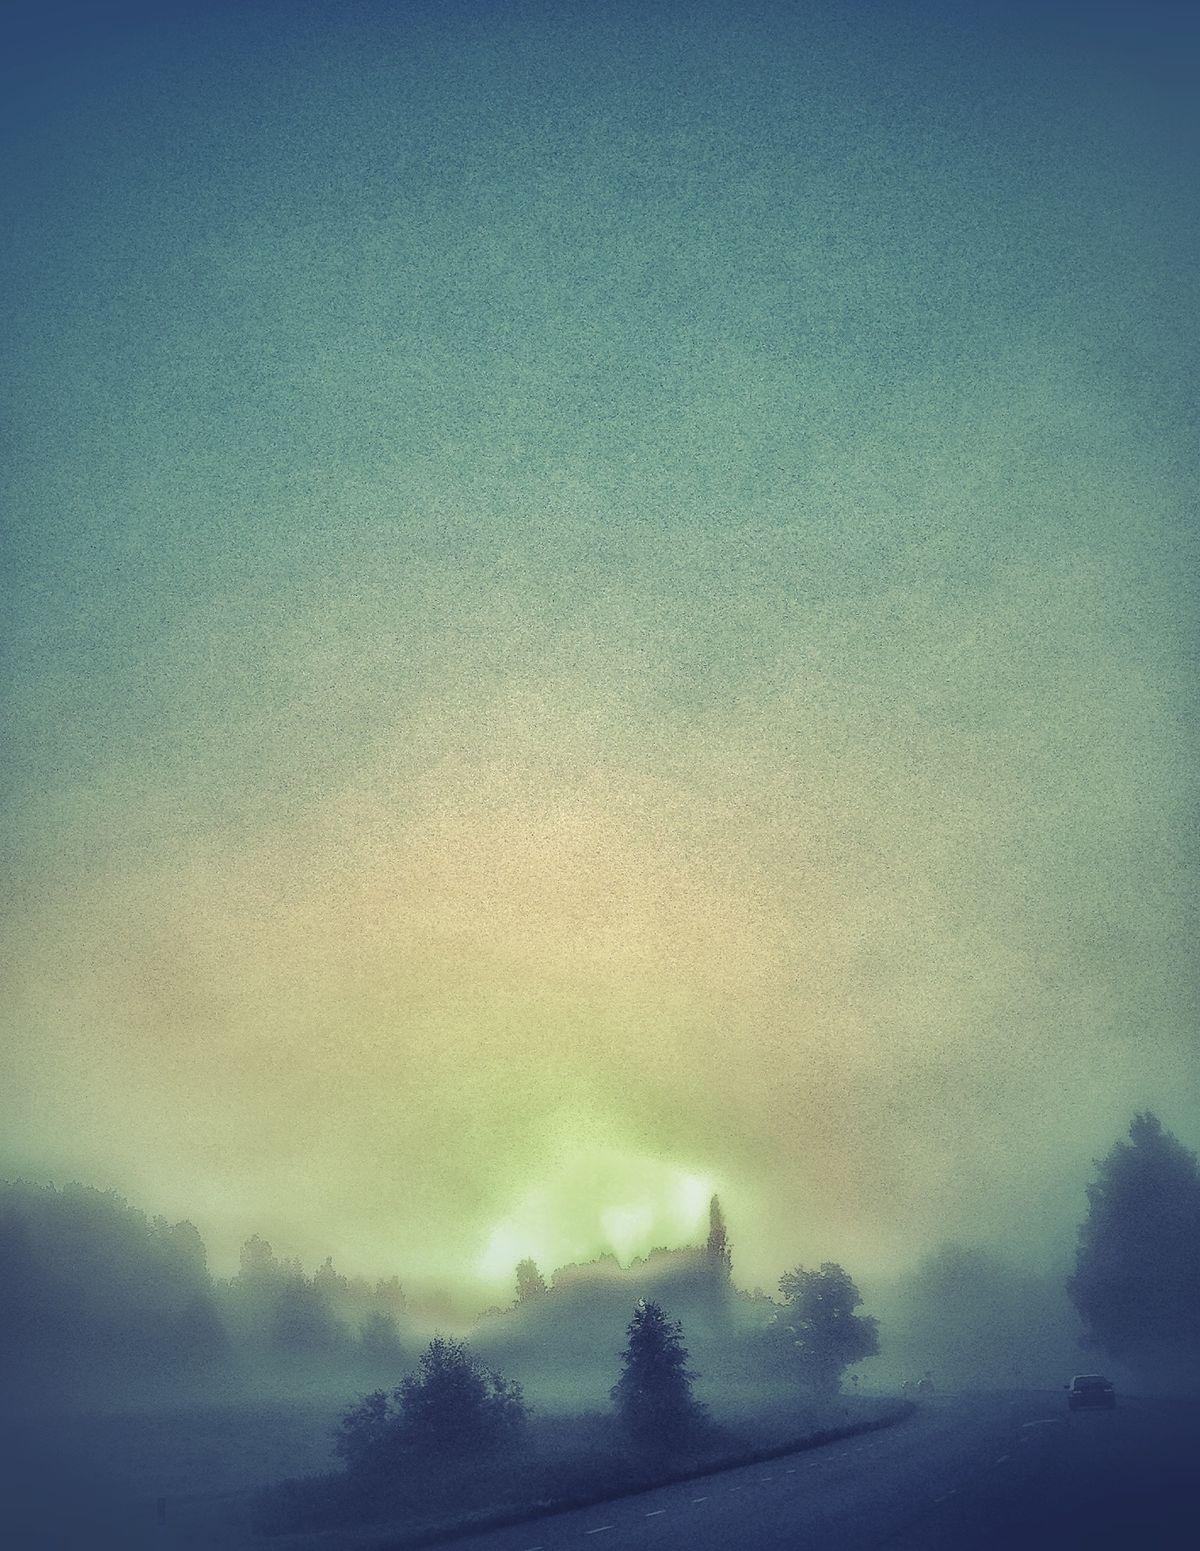 On The Road ! EyeEm Best Shots - Landscape EyeEm Best Shots - Trees EyeEm Nature Lover